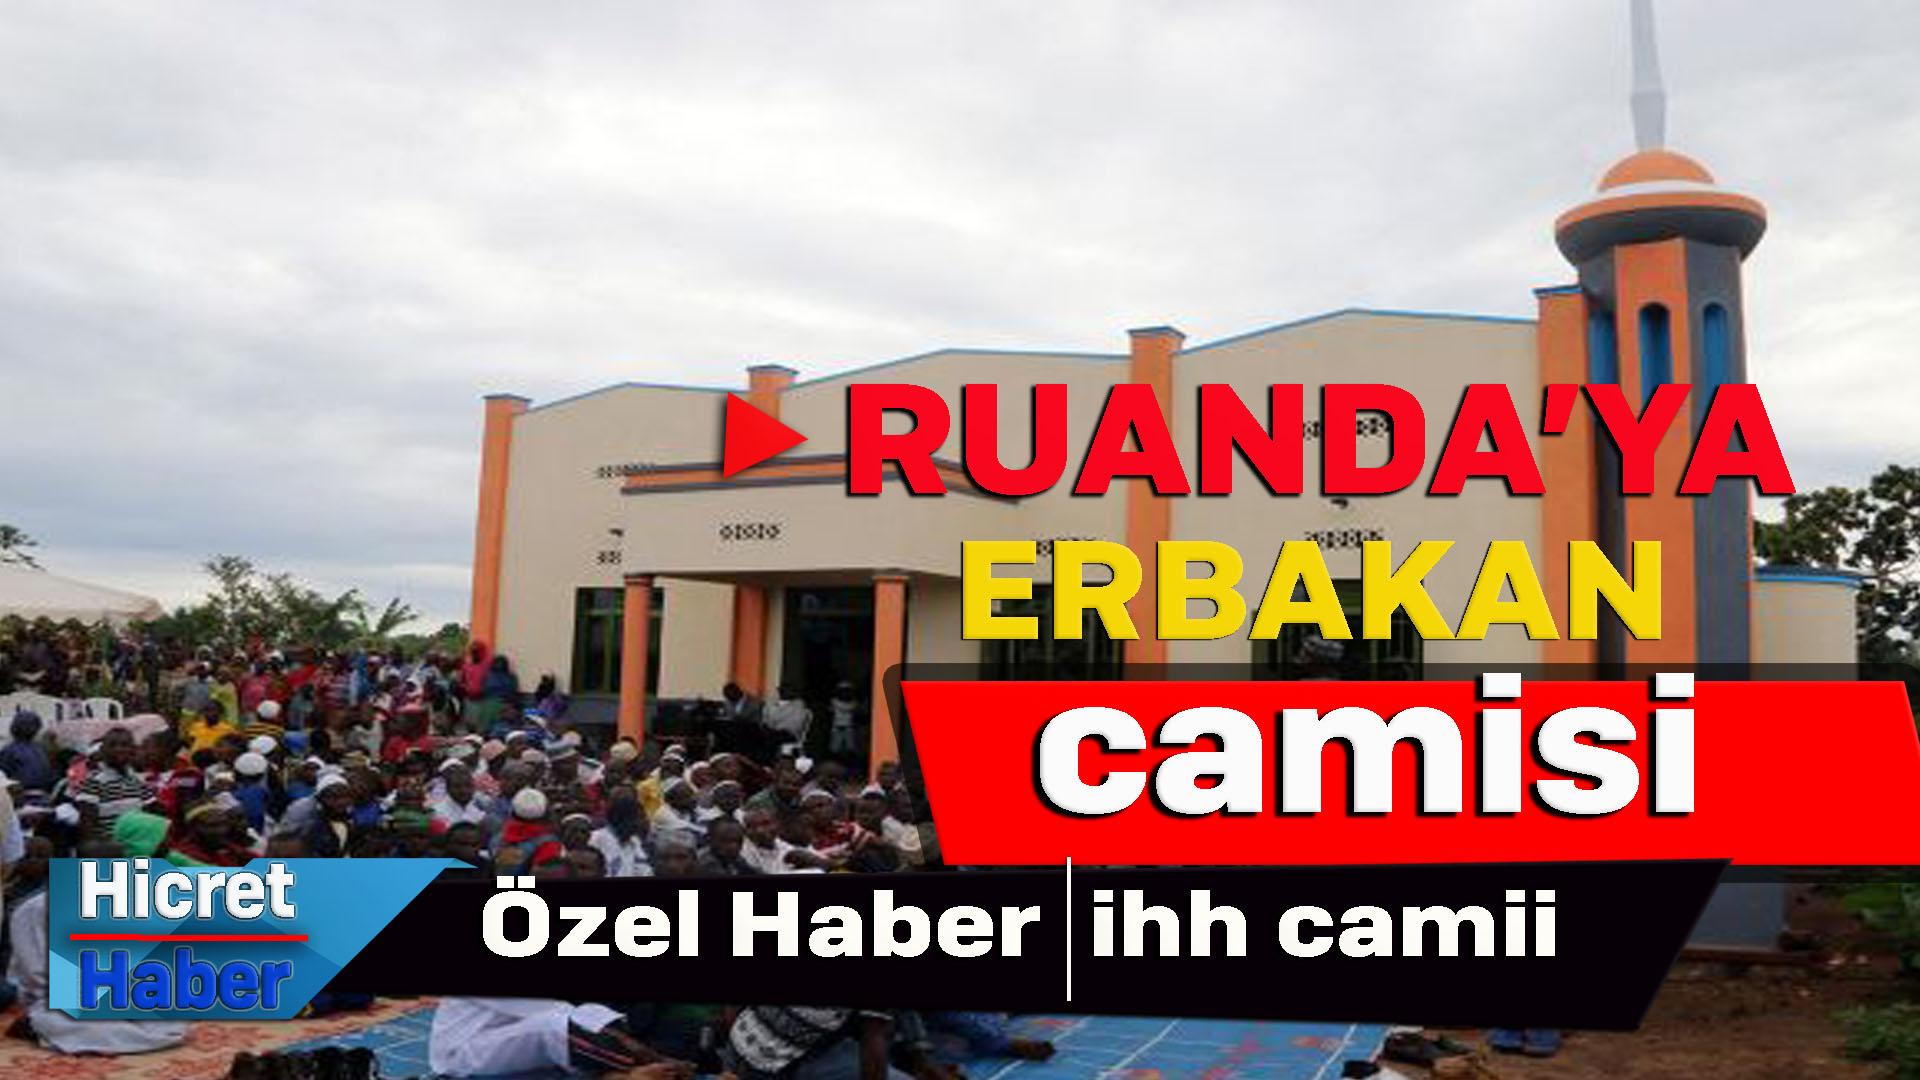 İhh Ruand'ya  Erbakan Camii Yaptı